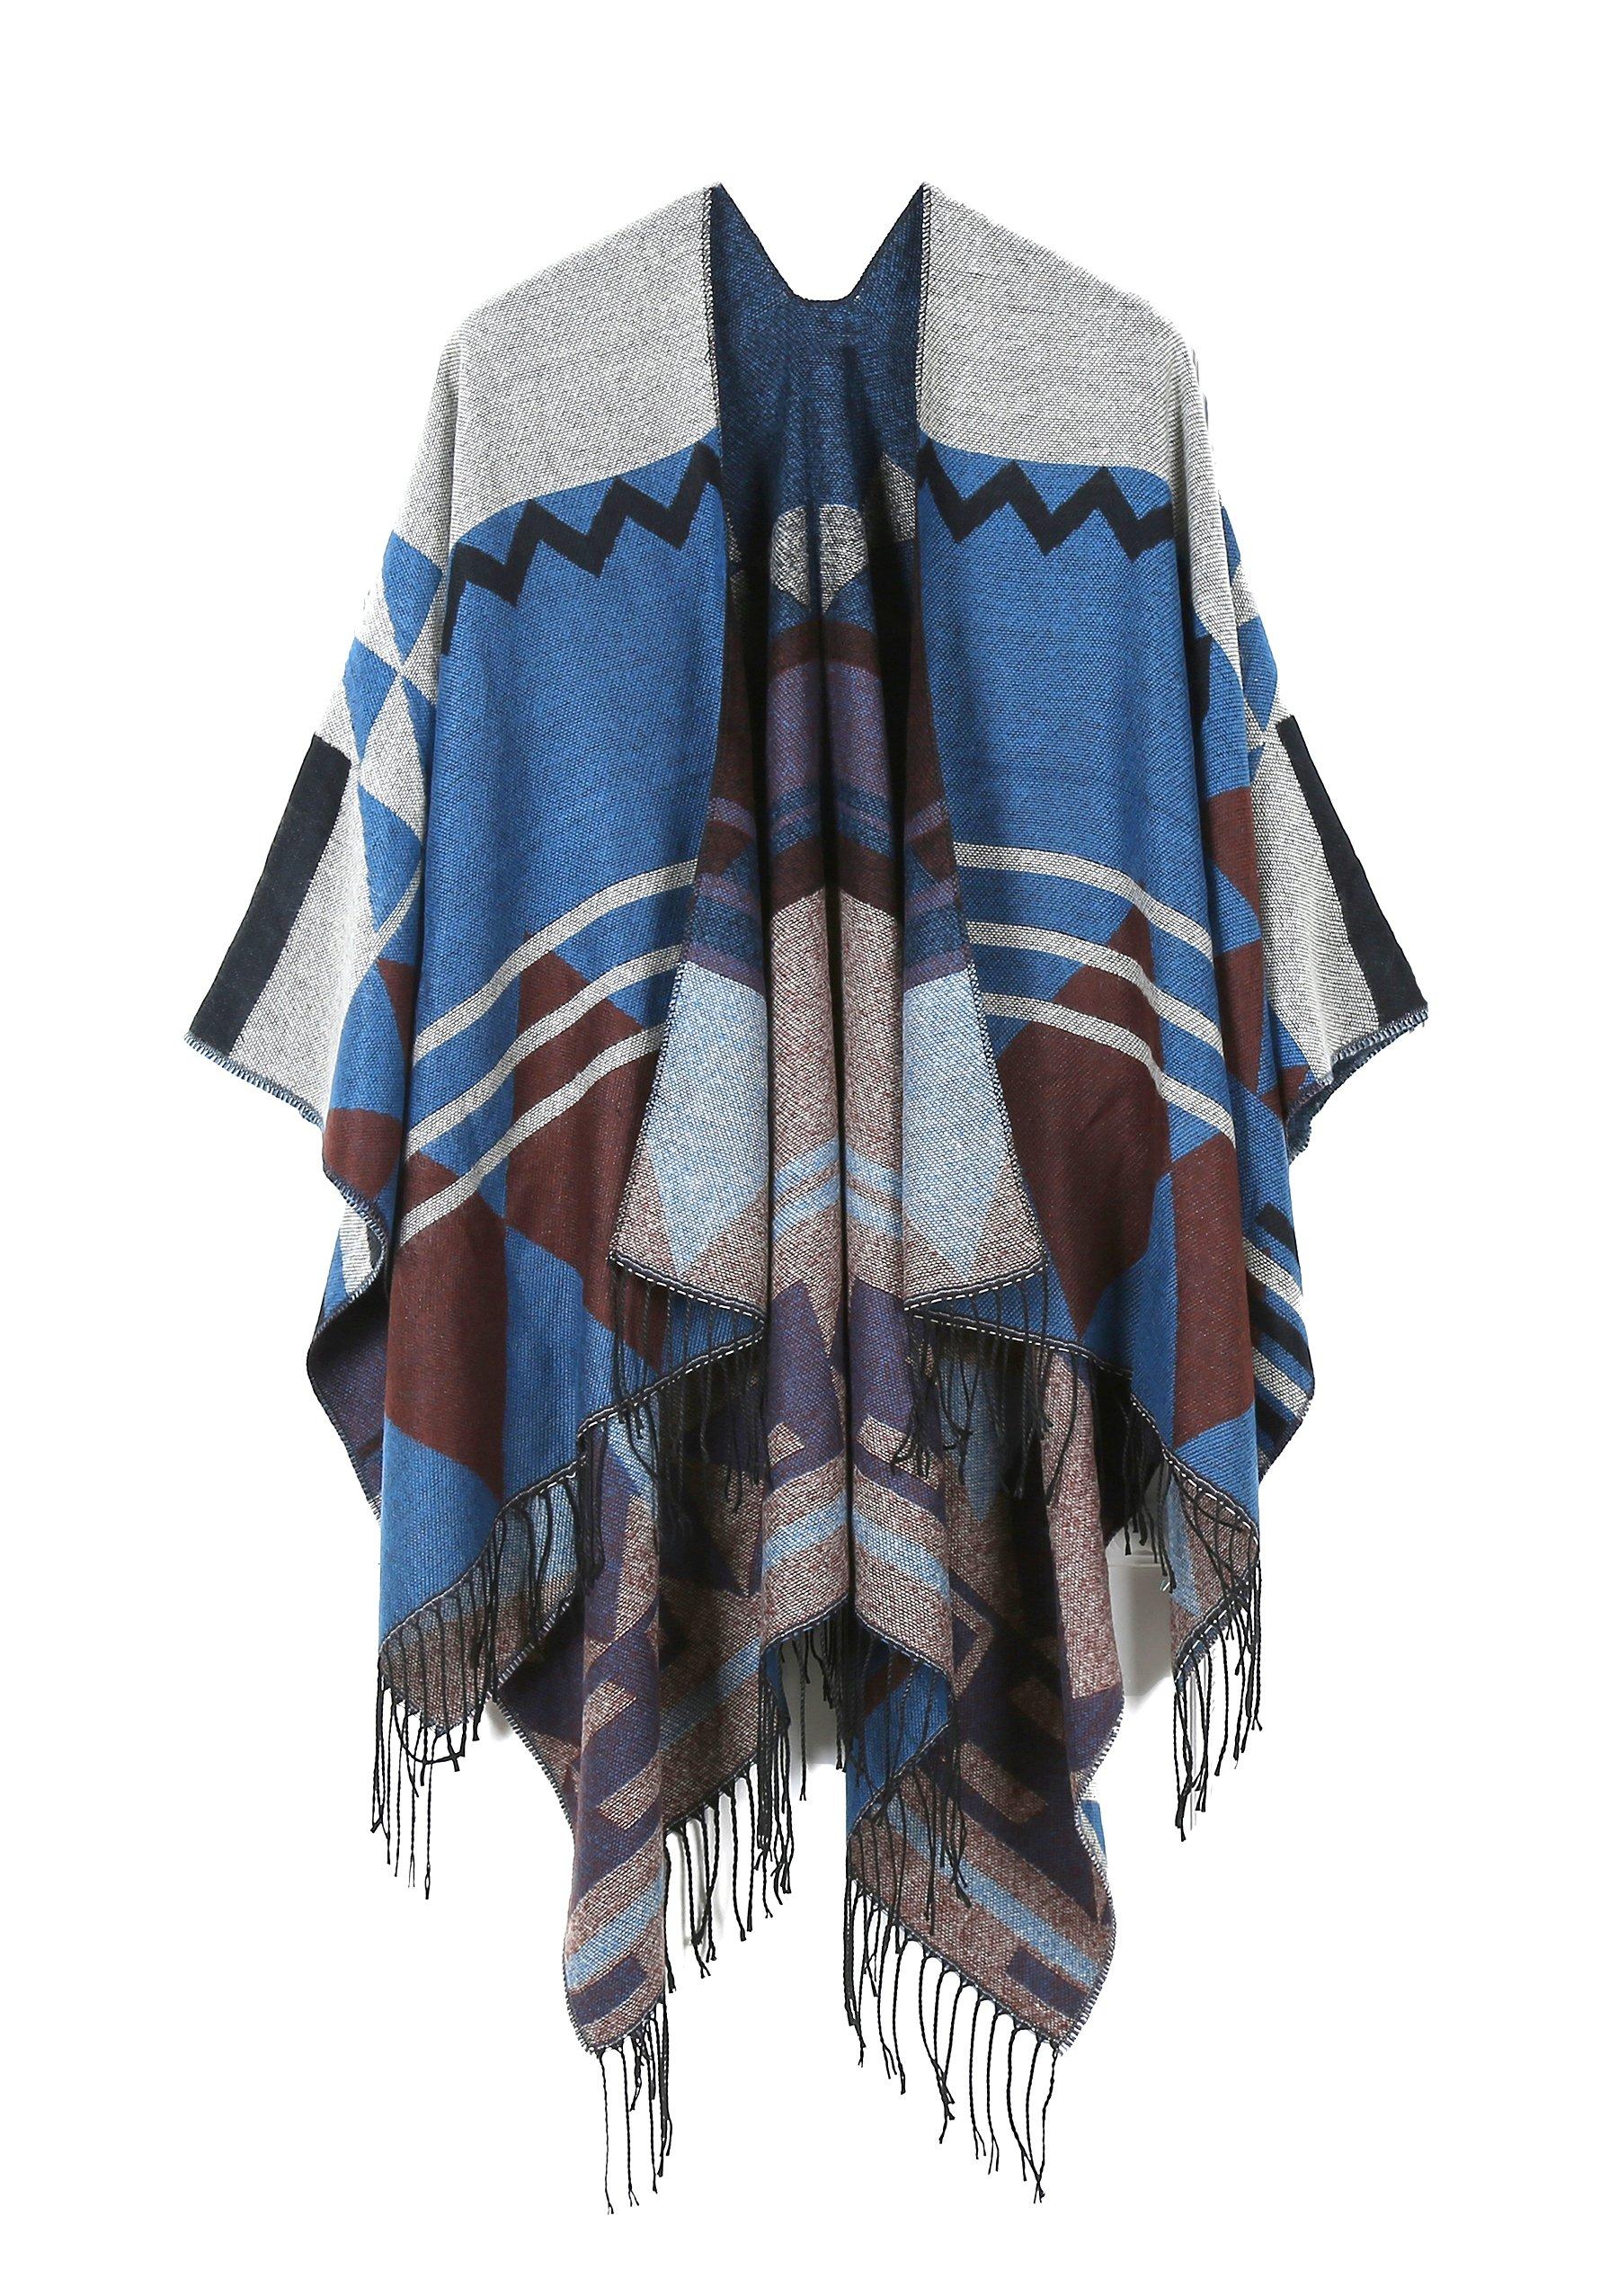 JURUAA Loose Mexican Wool Poncho Shawl Cloaks Cape Wrap Kimono Cardigans Navy